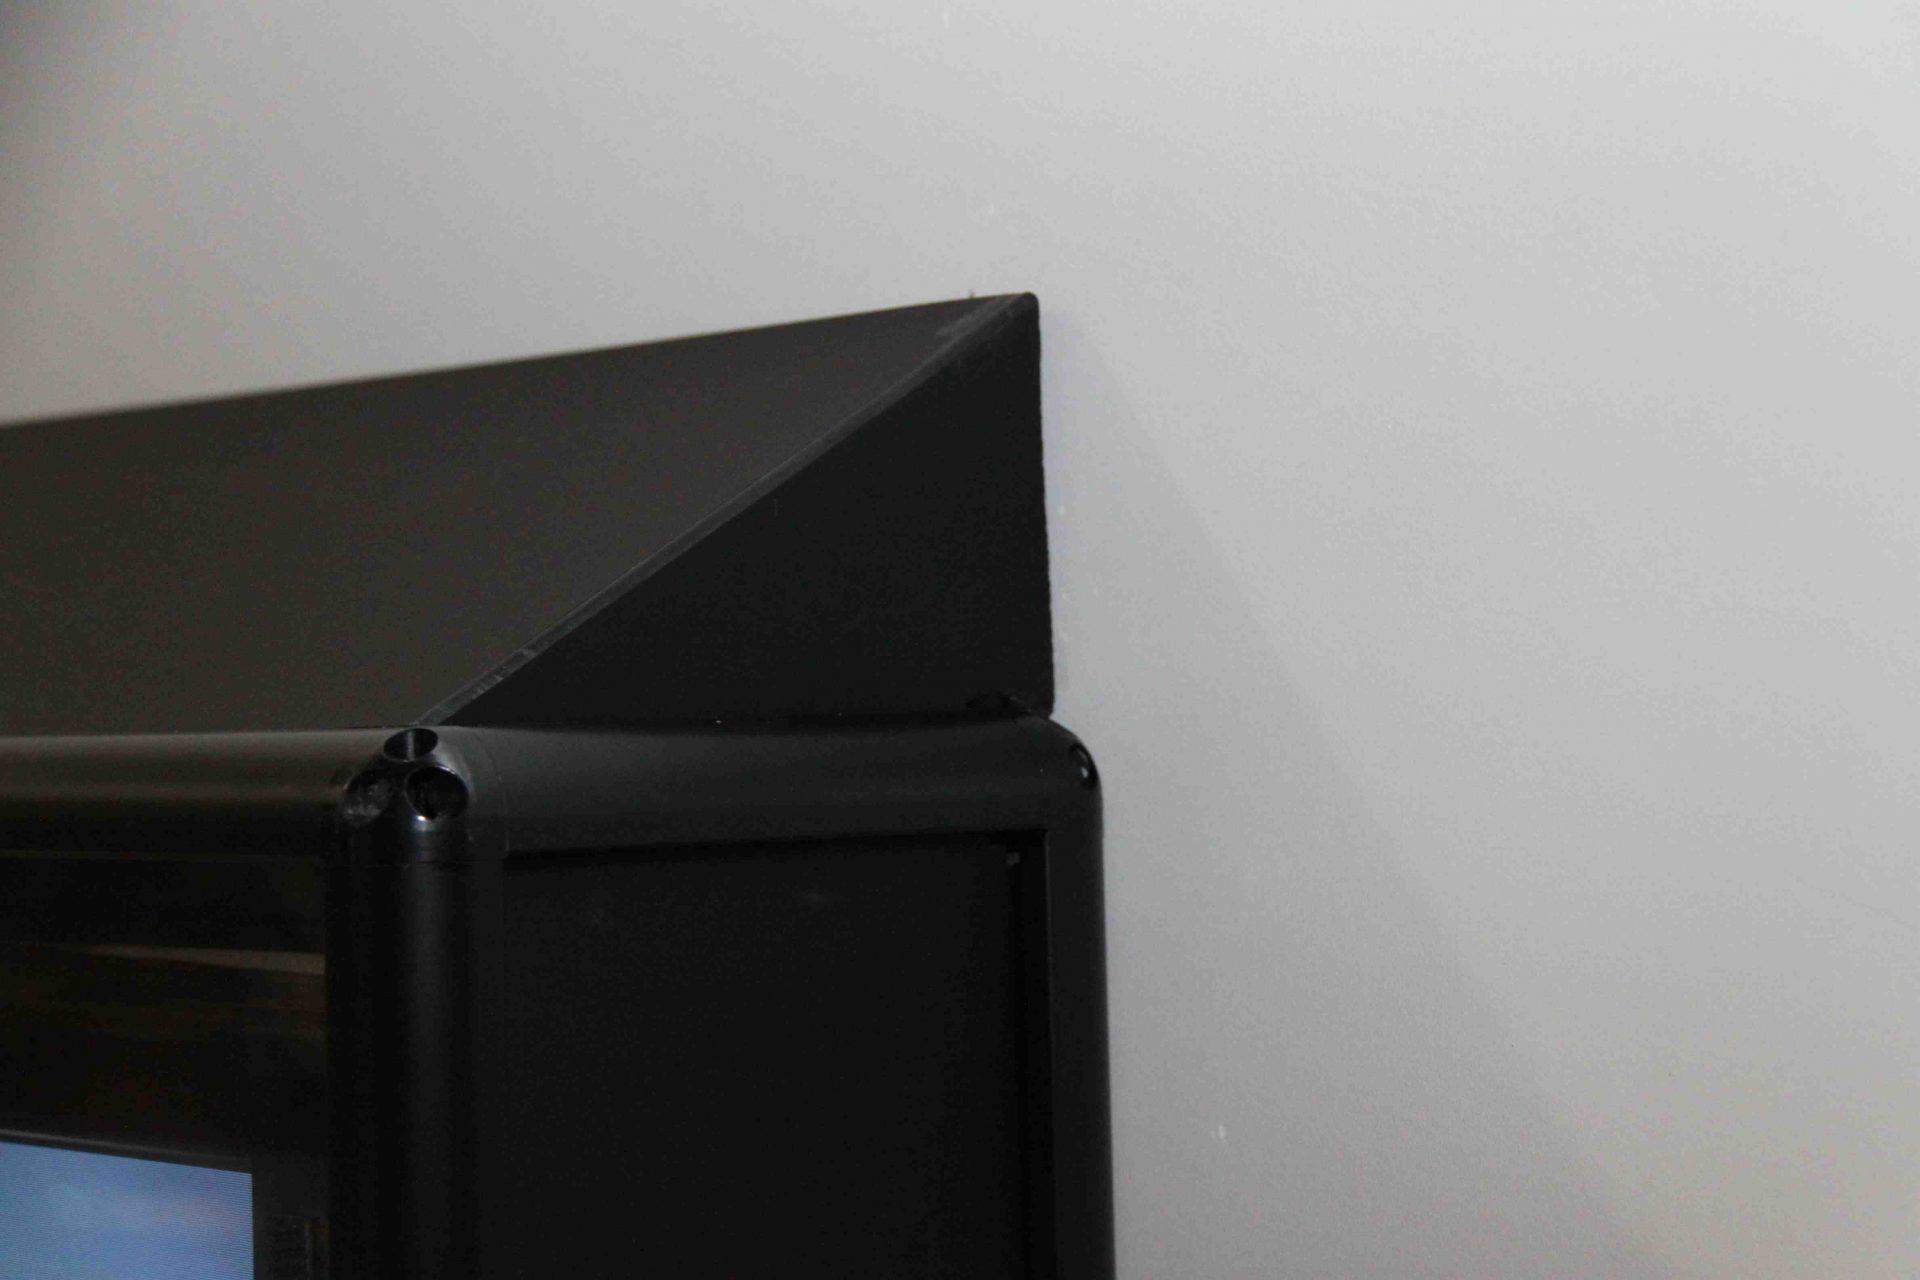 Ligature Resistant Protective Tv Enclosure Behavioral